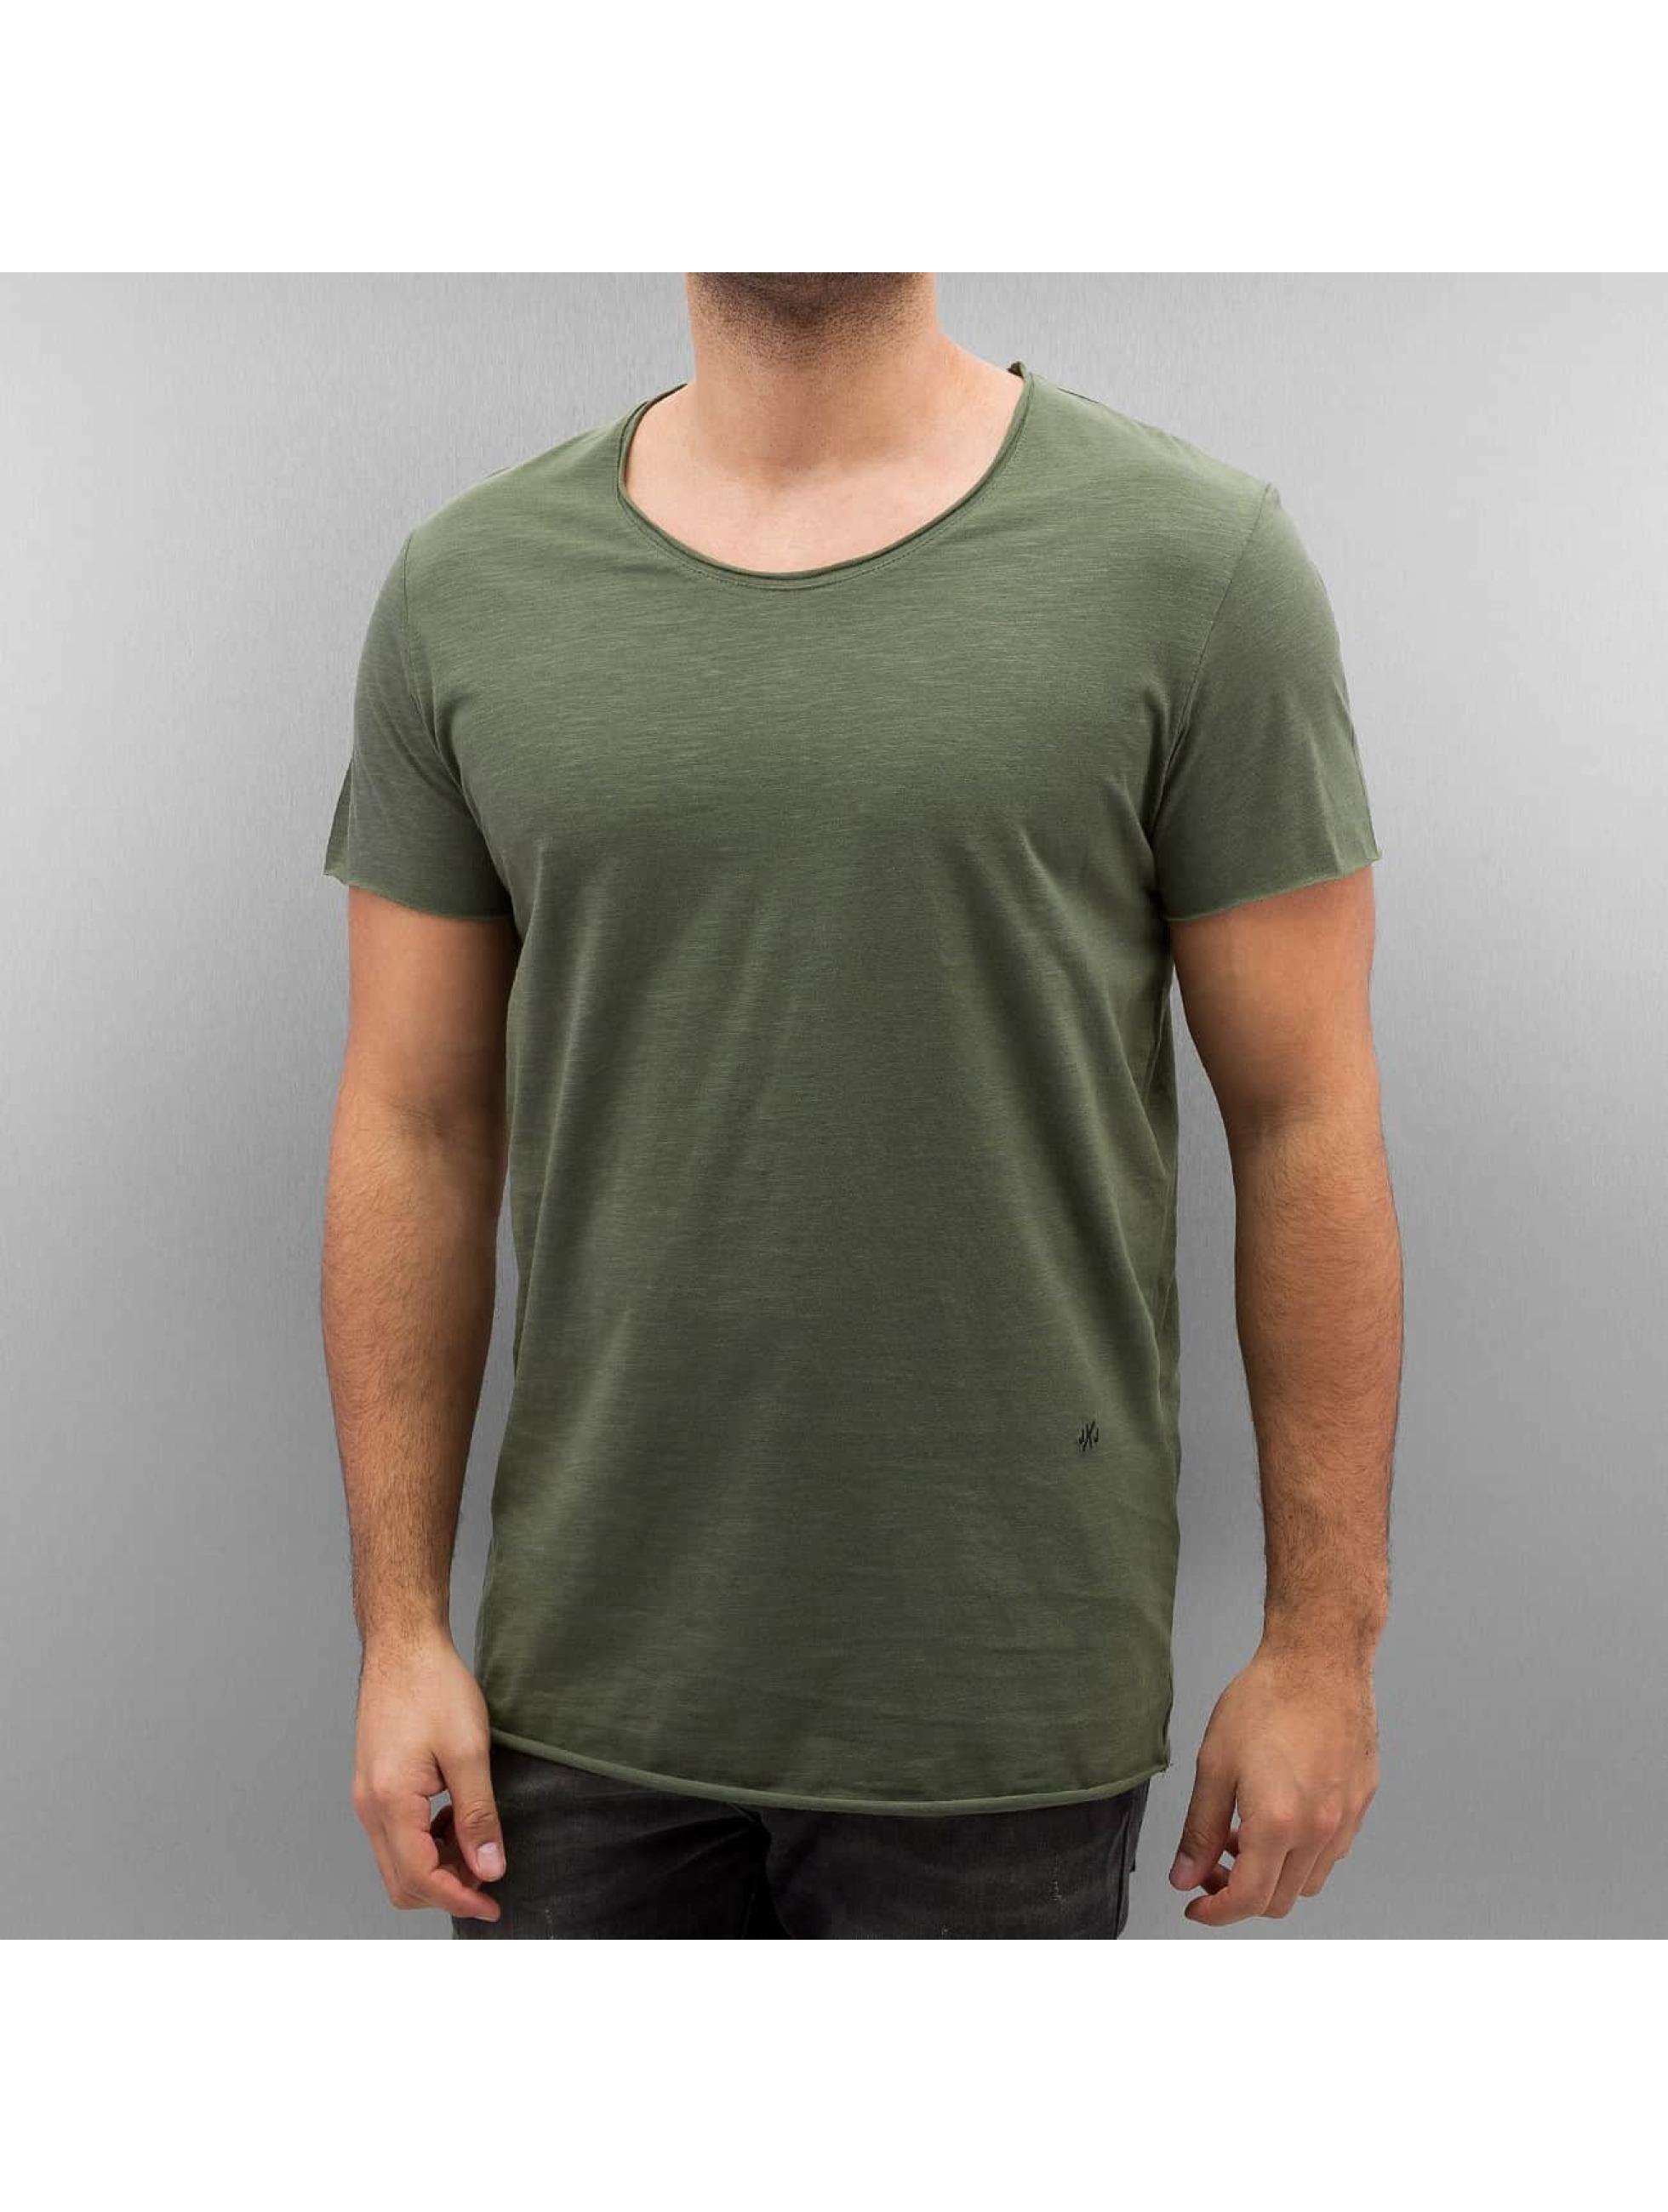 Jack & Jones T-Shirt jorBas olive